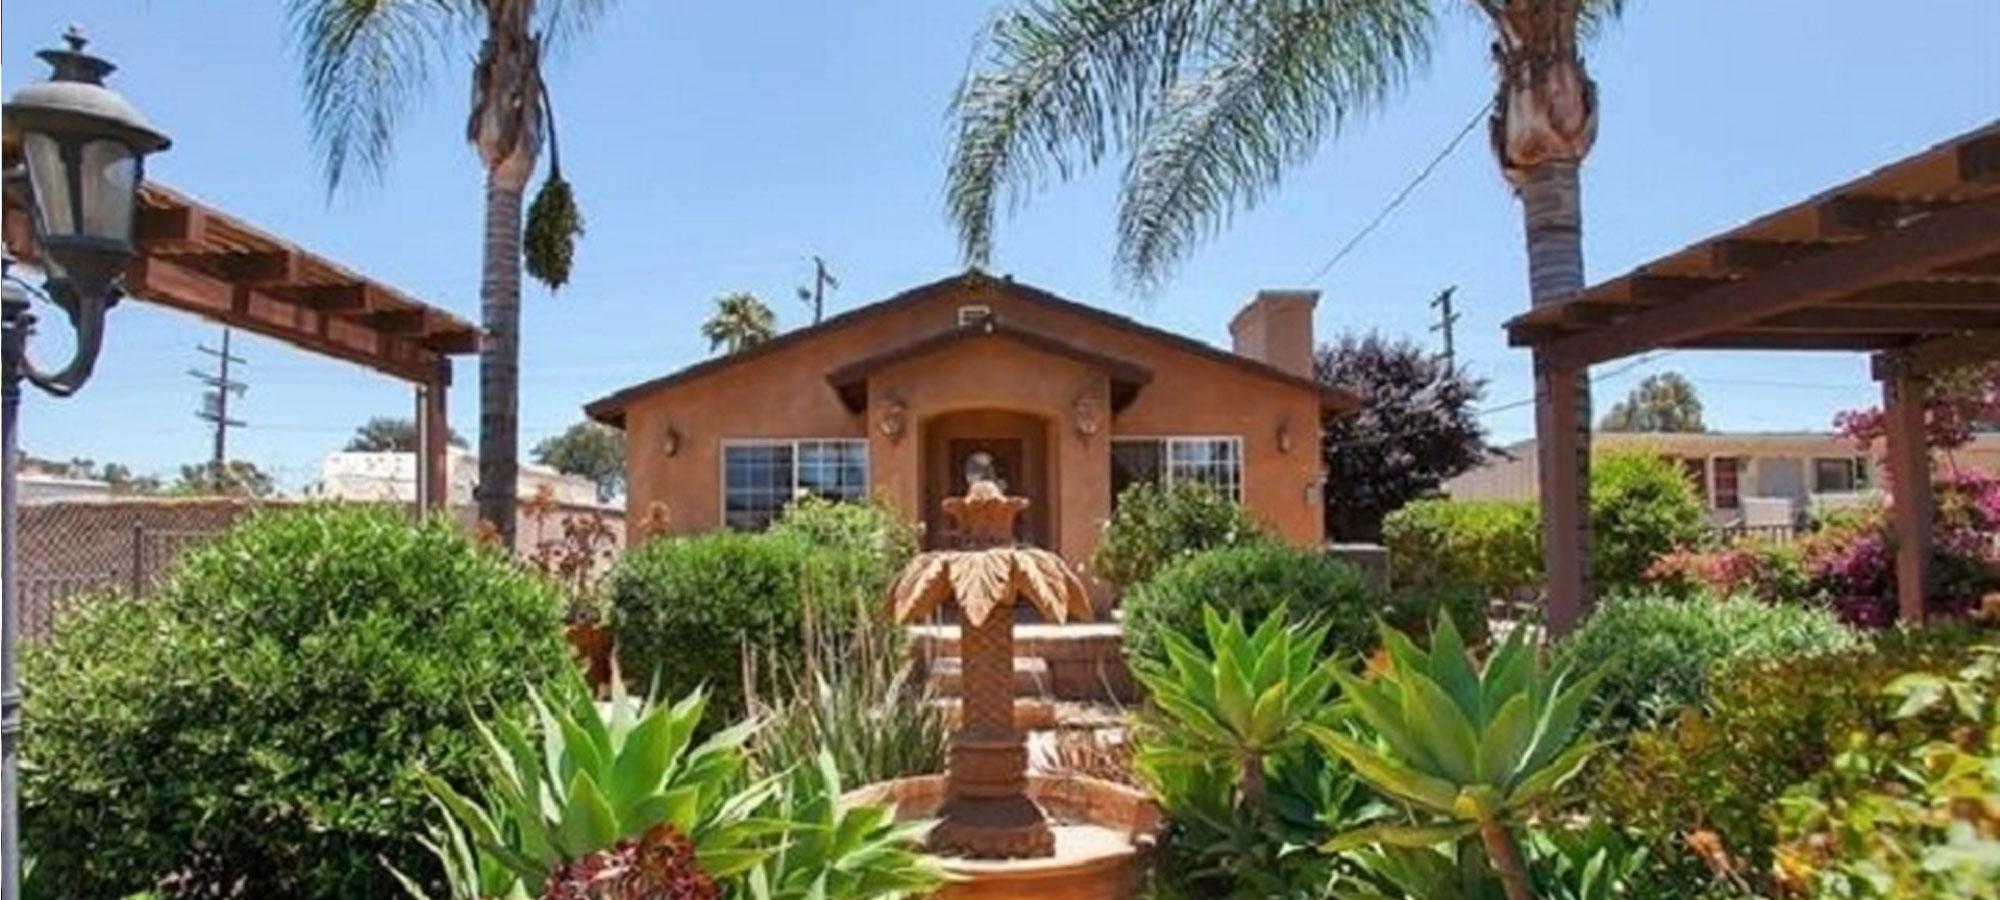 1028 B Street, Ramona, CA 92065